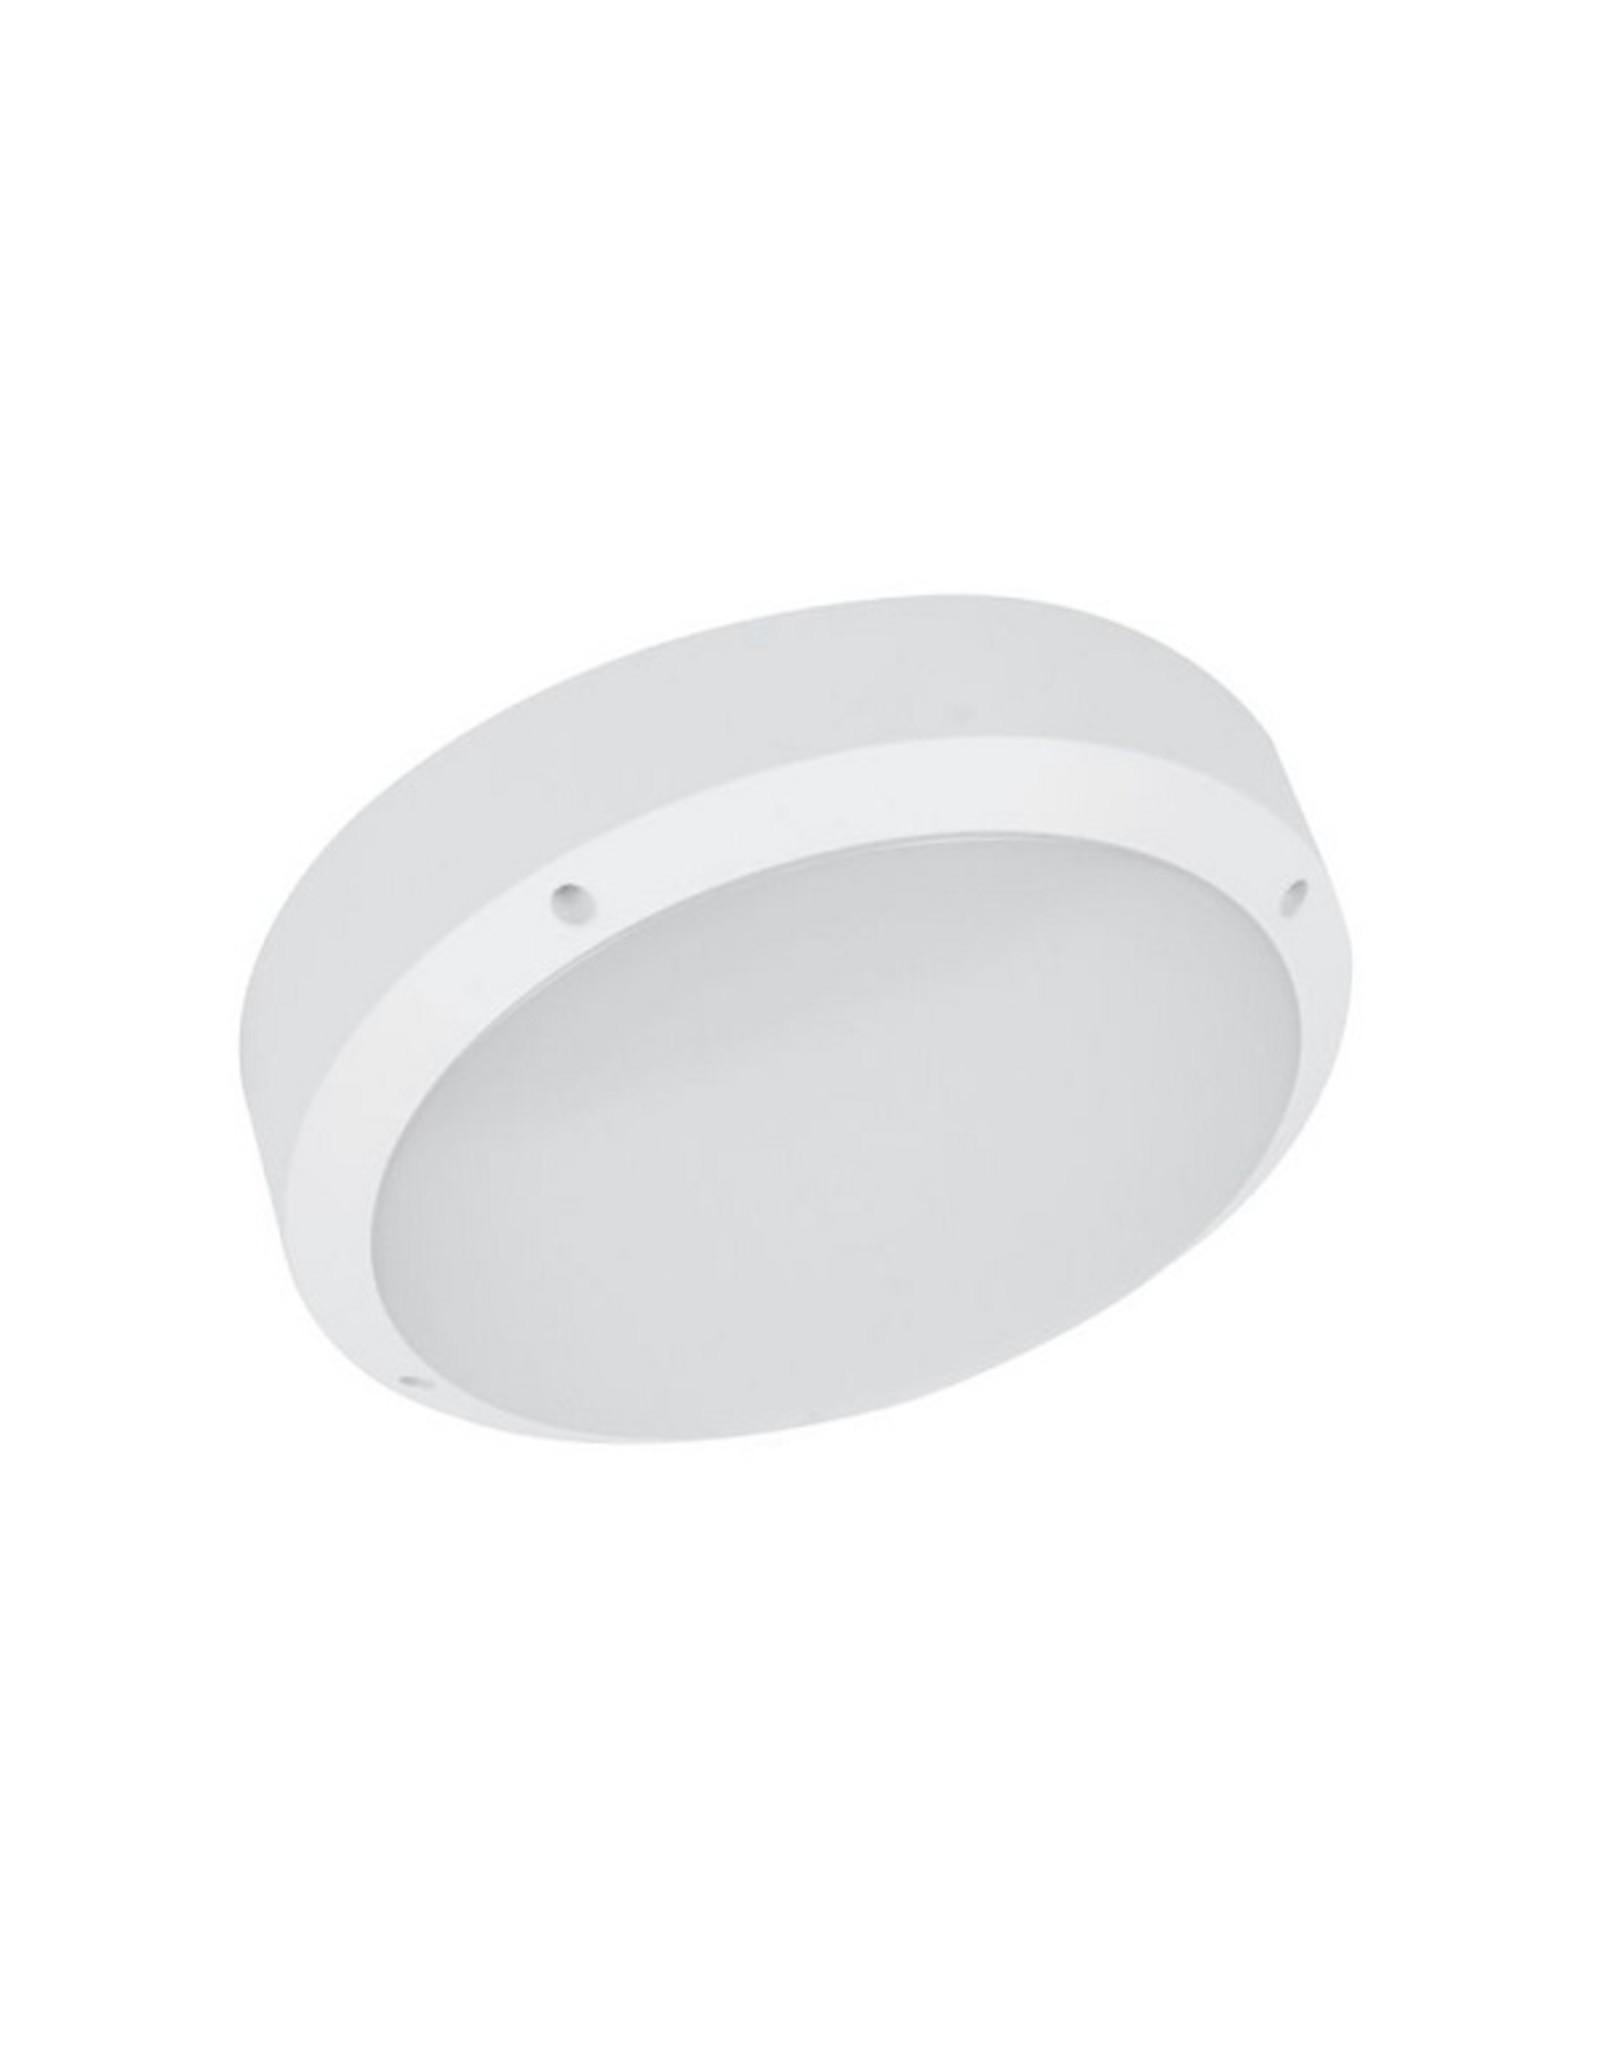 LedLed LED Plafonniere IK10 ROLO 28W 4000k